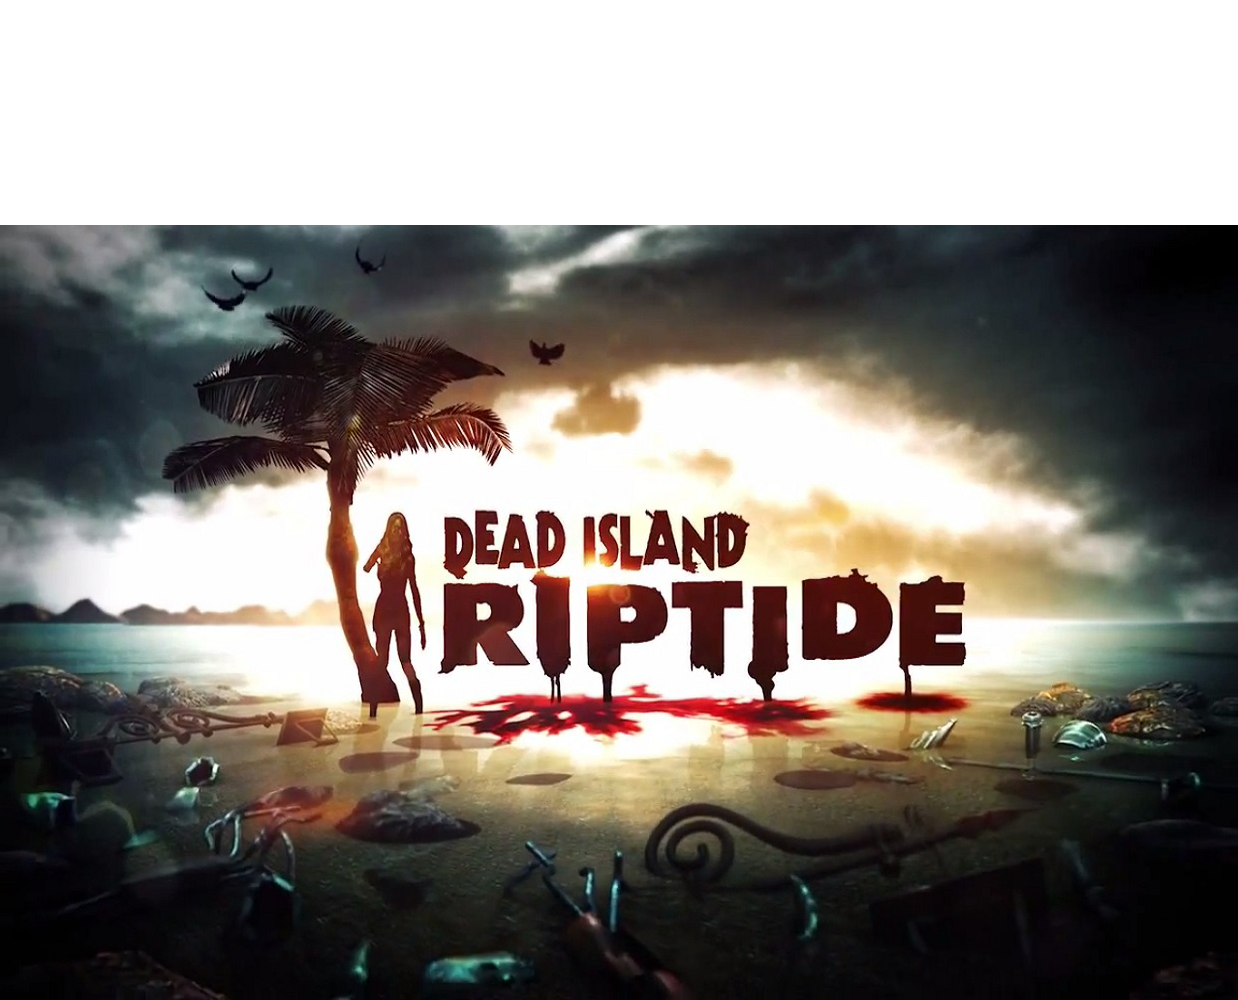 http://radioaktywne-recenzje.blogspot.com/2013/10/dead-island-ripitde-dodaje-wiele.html